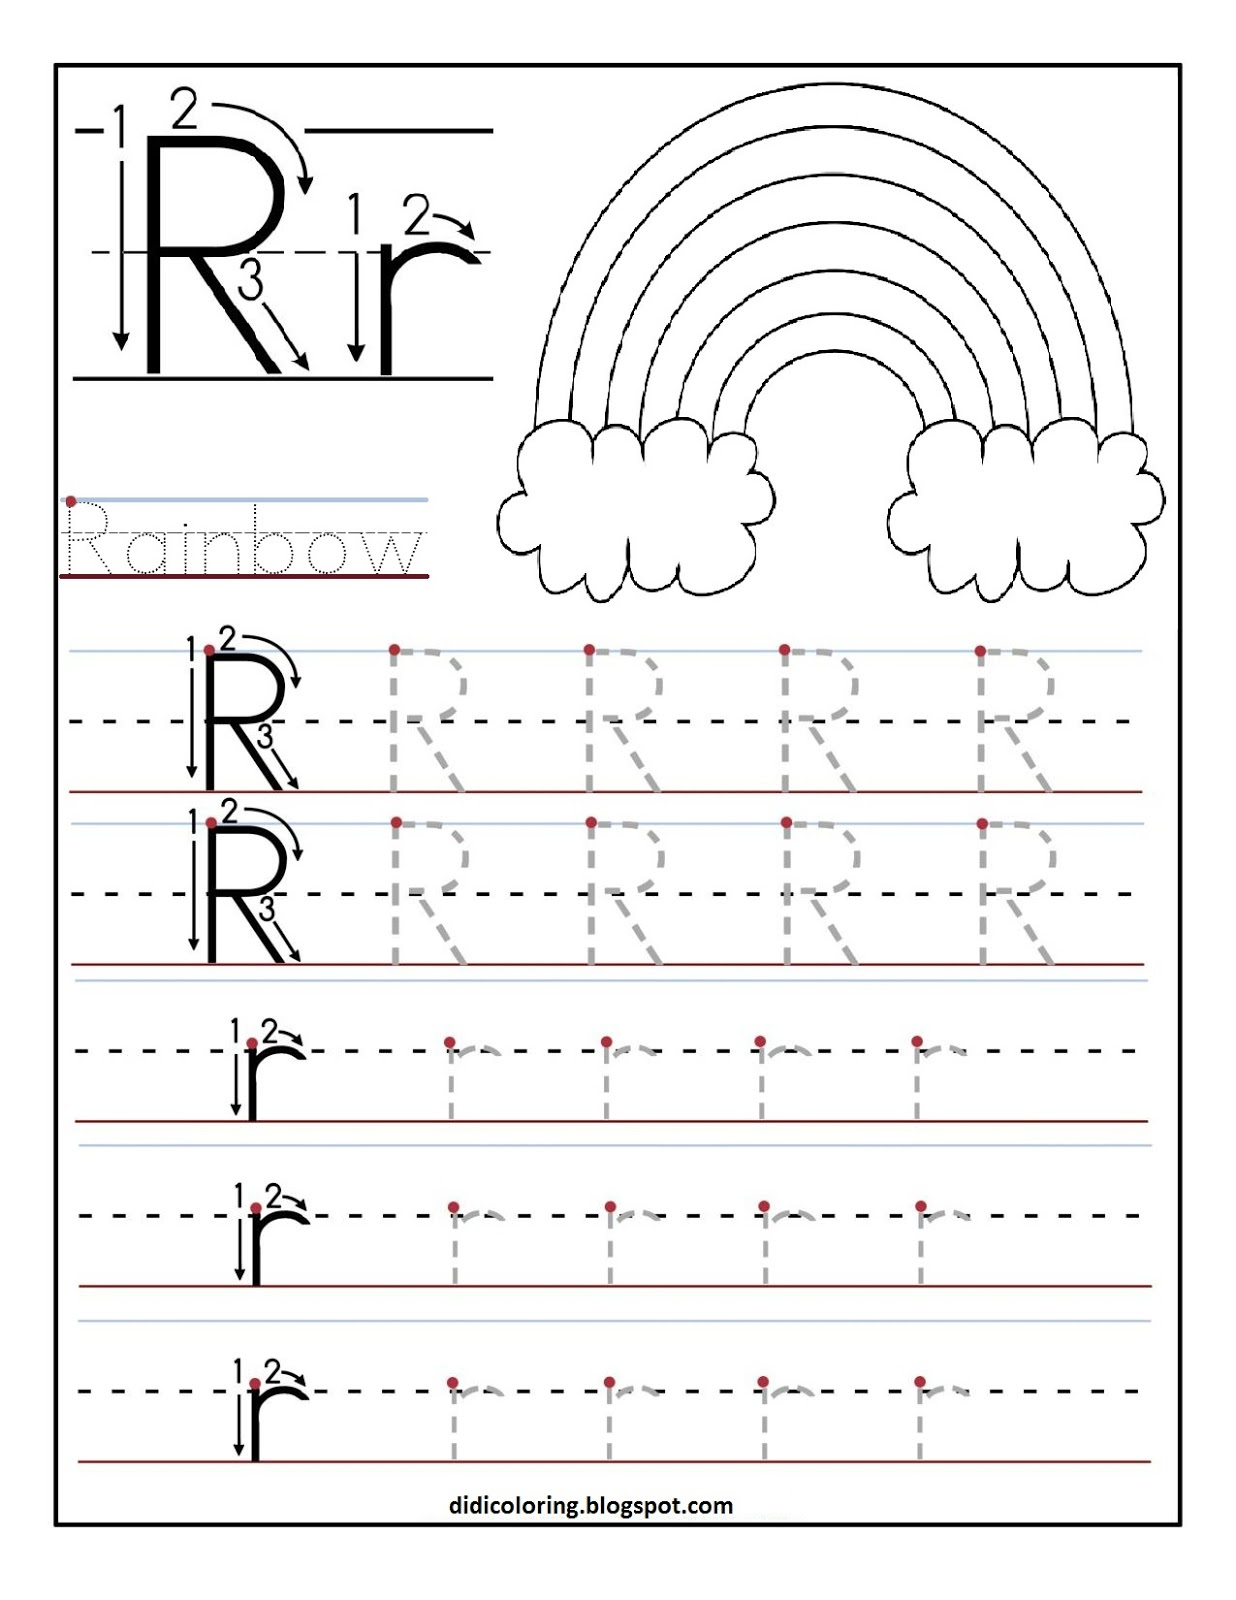 Tracing alphabet worksheets for preschoolers